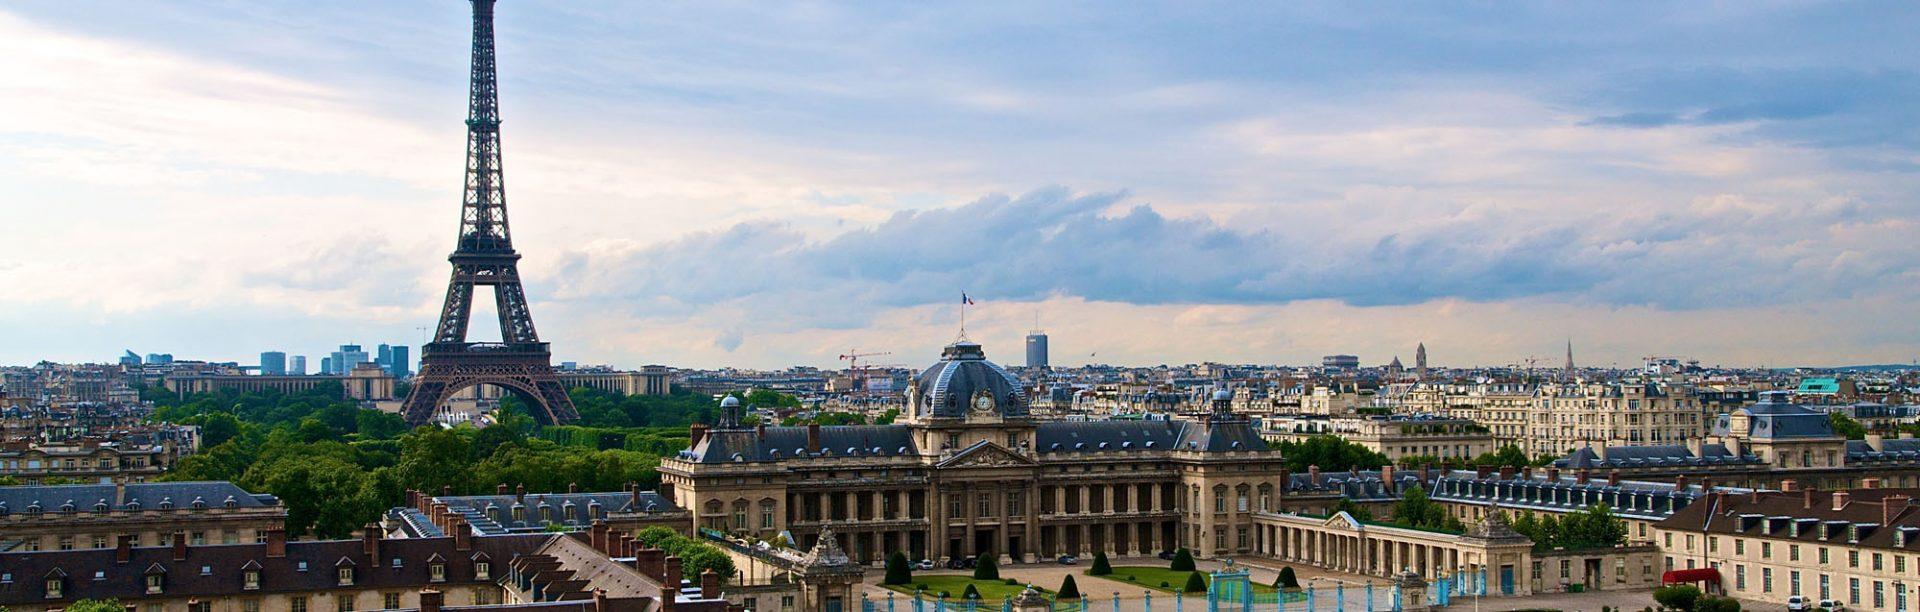 paris-banner